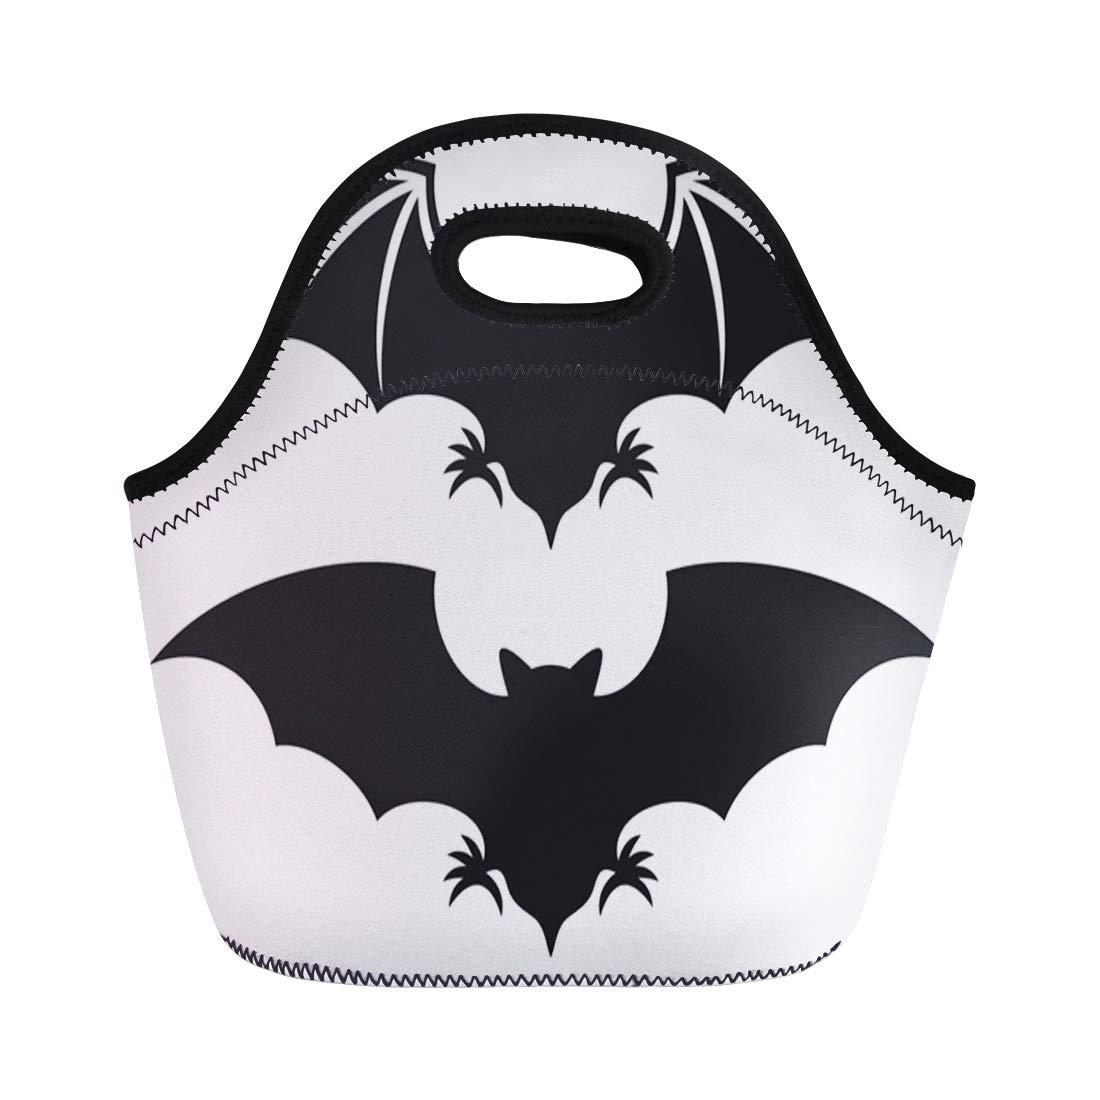 b3d2ce15f054 Amazon.com: Semtomn Lunch Tote Bag Halloween Flight of Bat ...